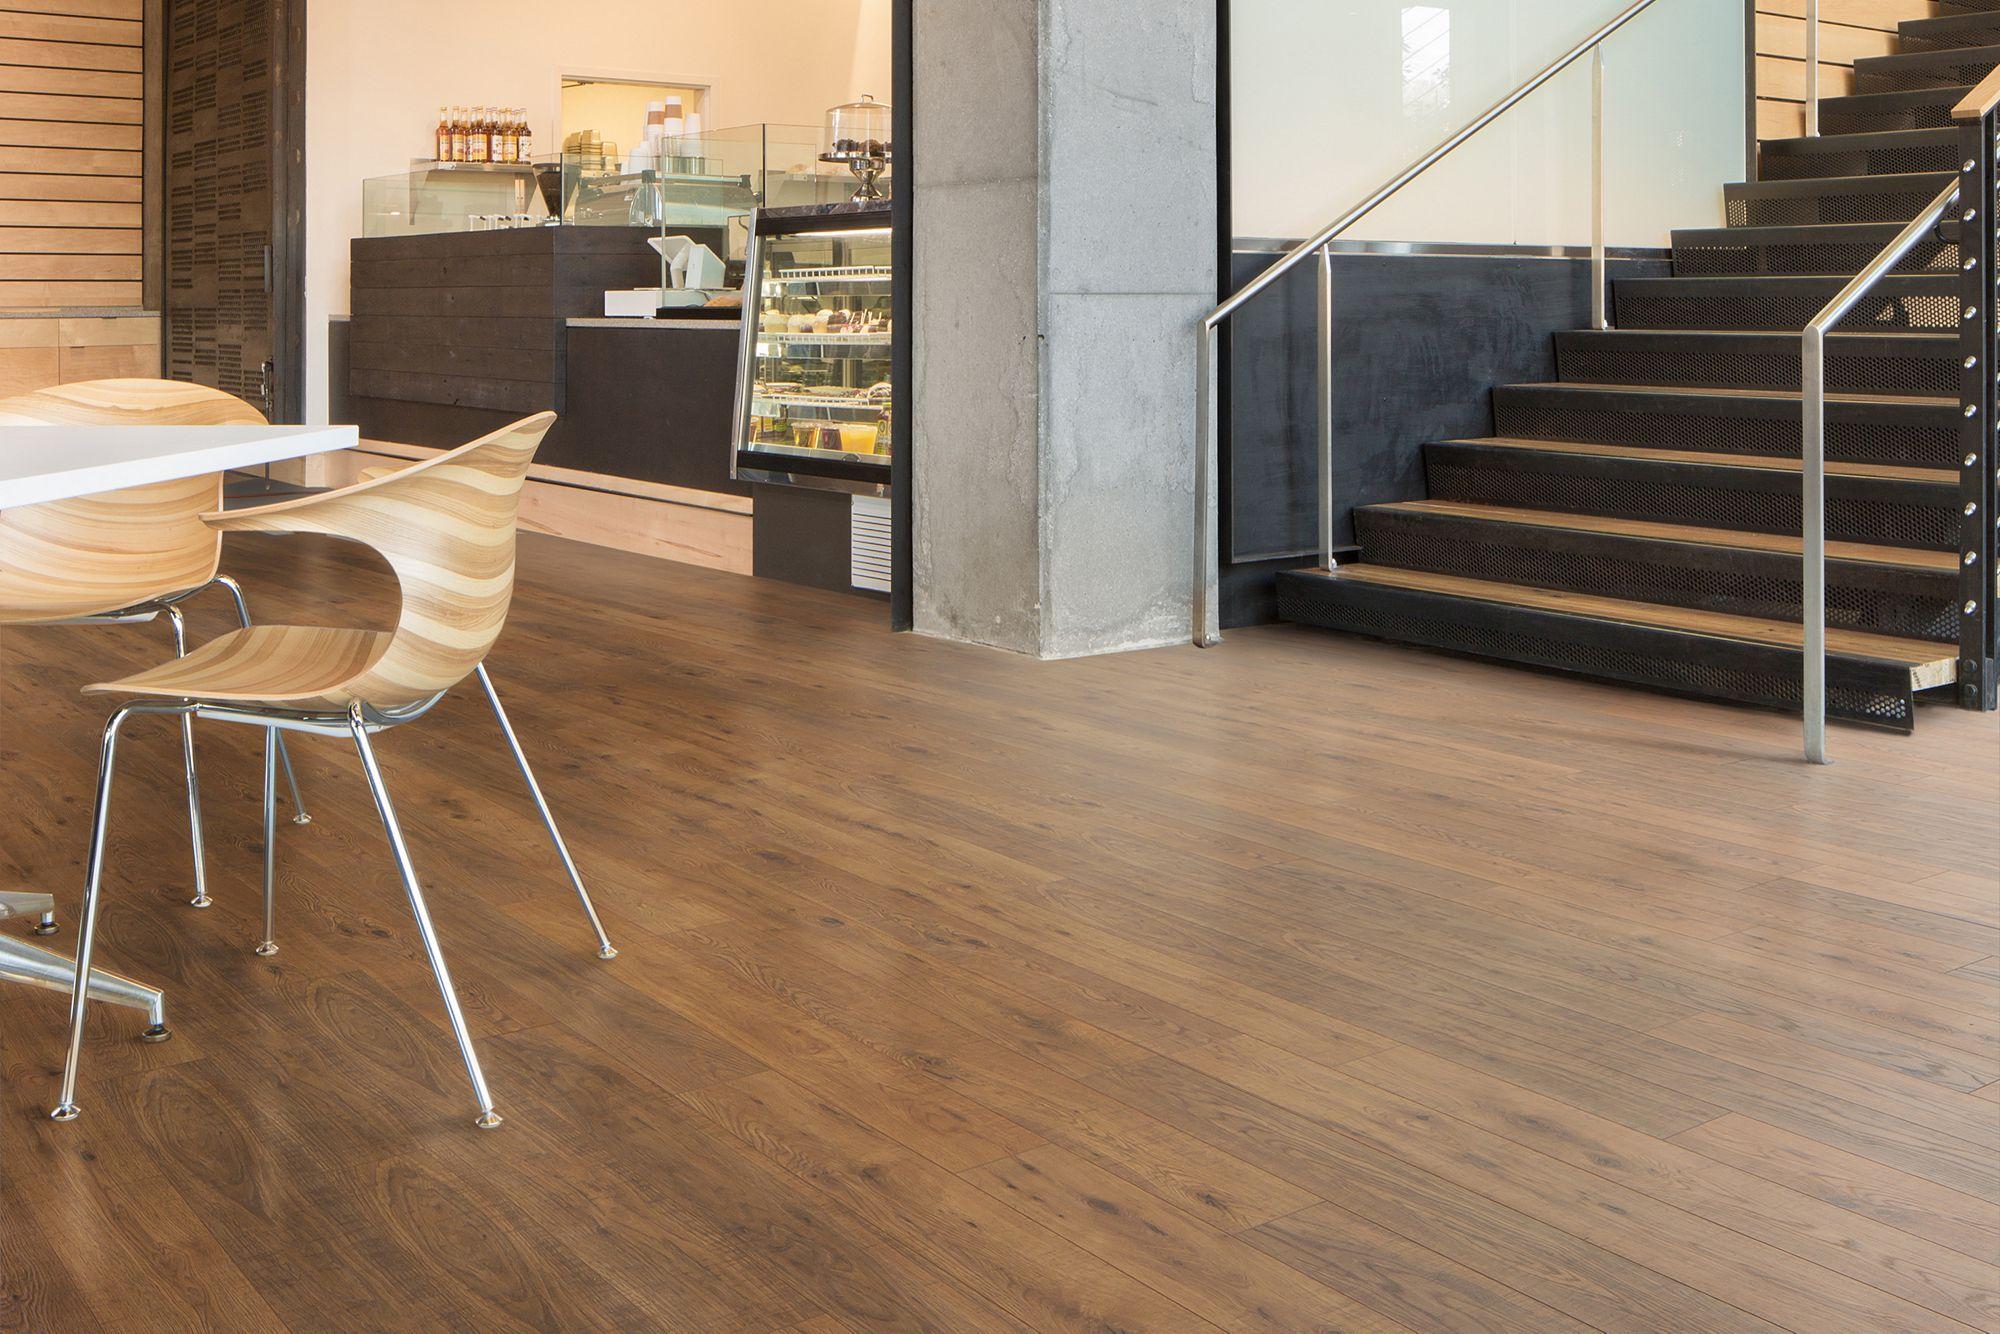 plank samples angle hardwood wide free lamton collection modern ash blonde floors p